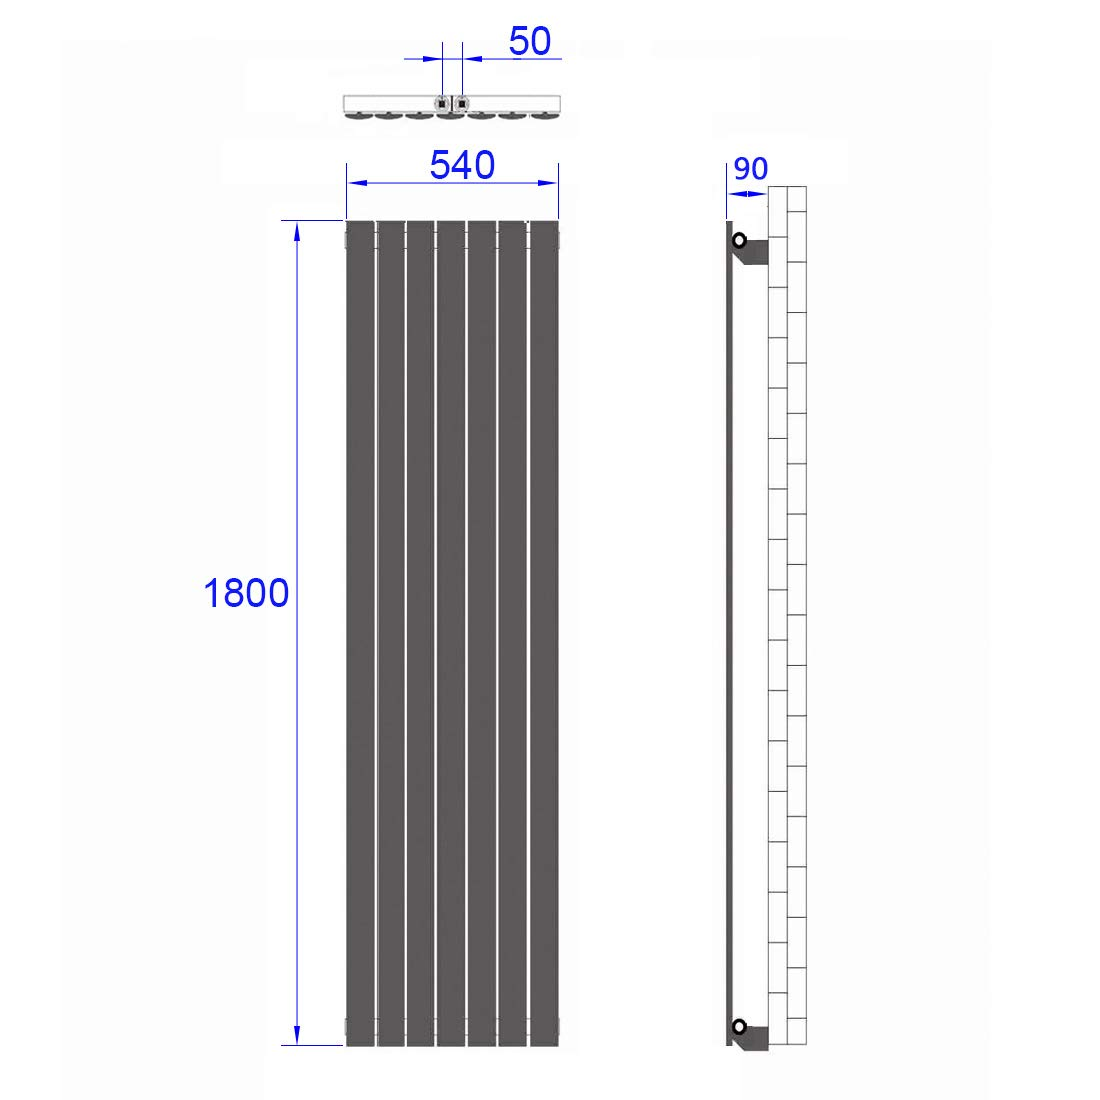 Wei/ß Vertikal Heizk/örper Design Paneelheizk/örper 1800x540mm Flach Doppellagig Mittelanschluss Heizung